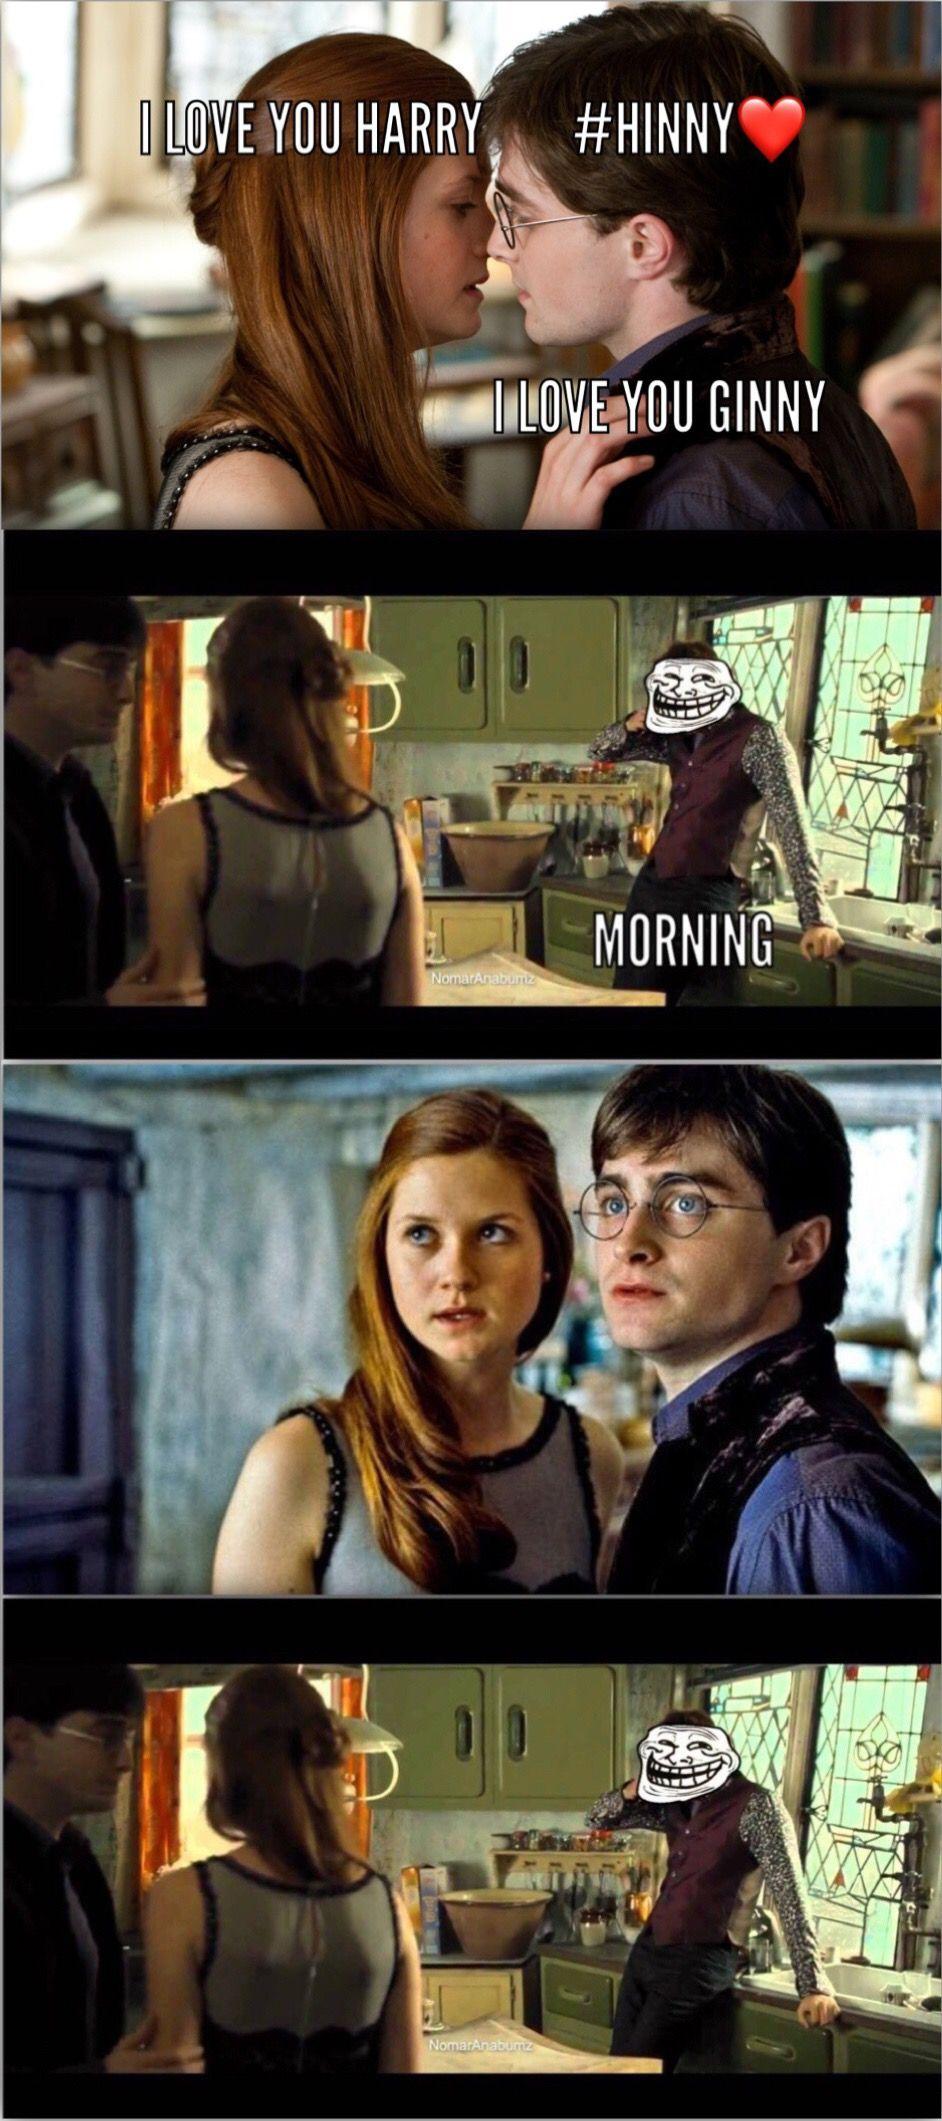 Harrypottermemes Harry Potter Kiss Harry Potter Memes Harry Potter Funny